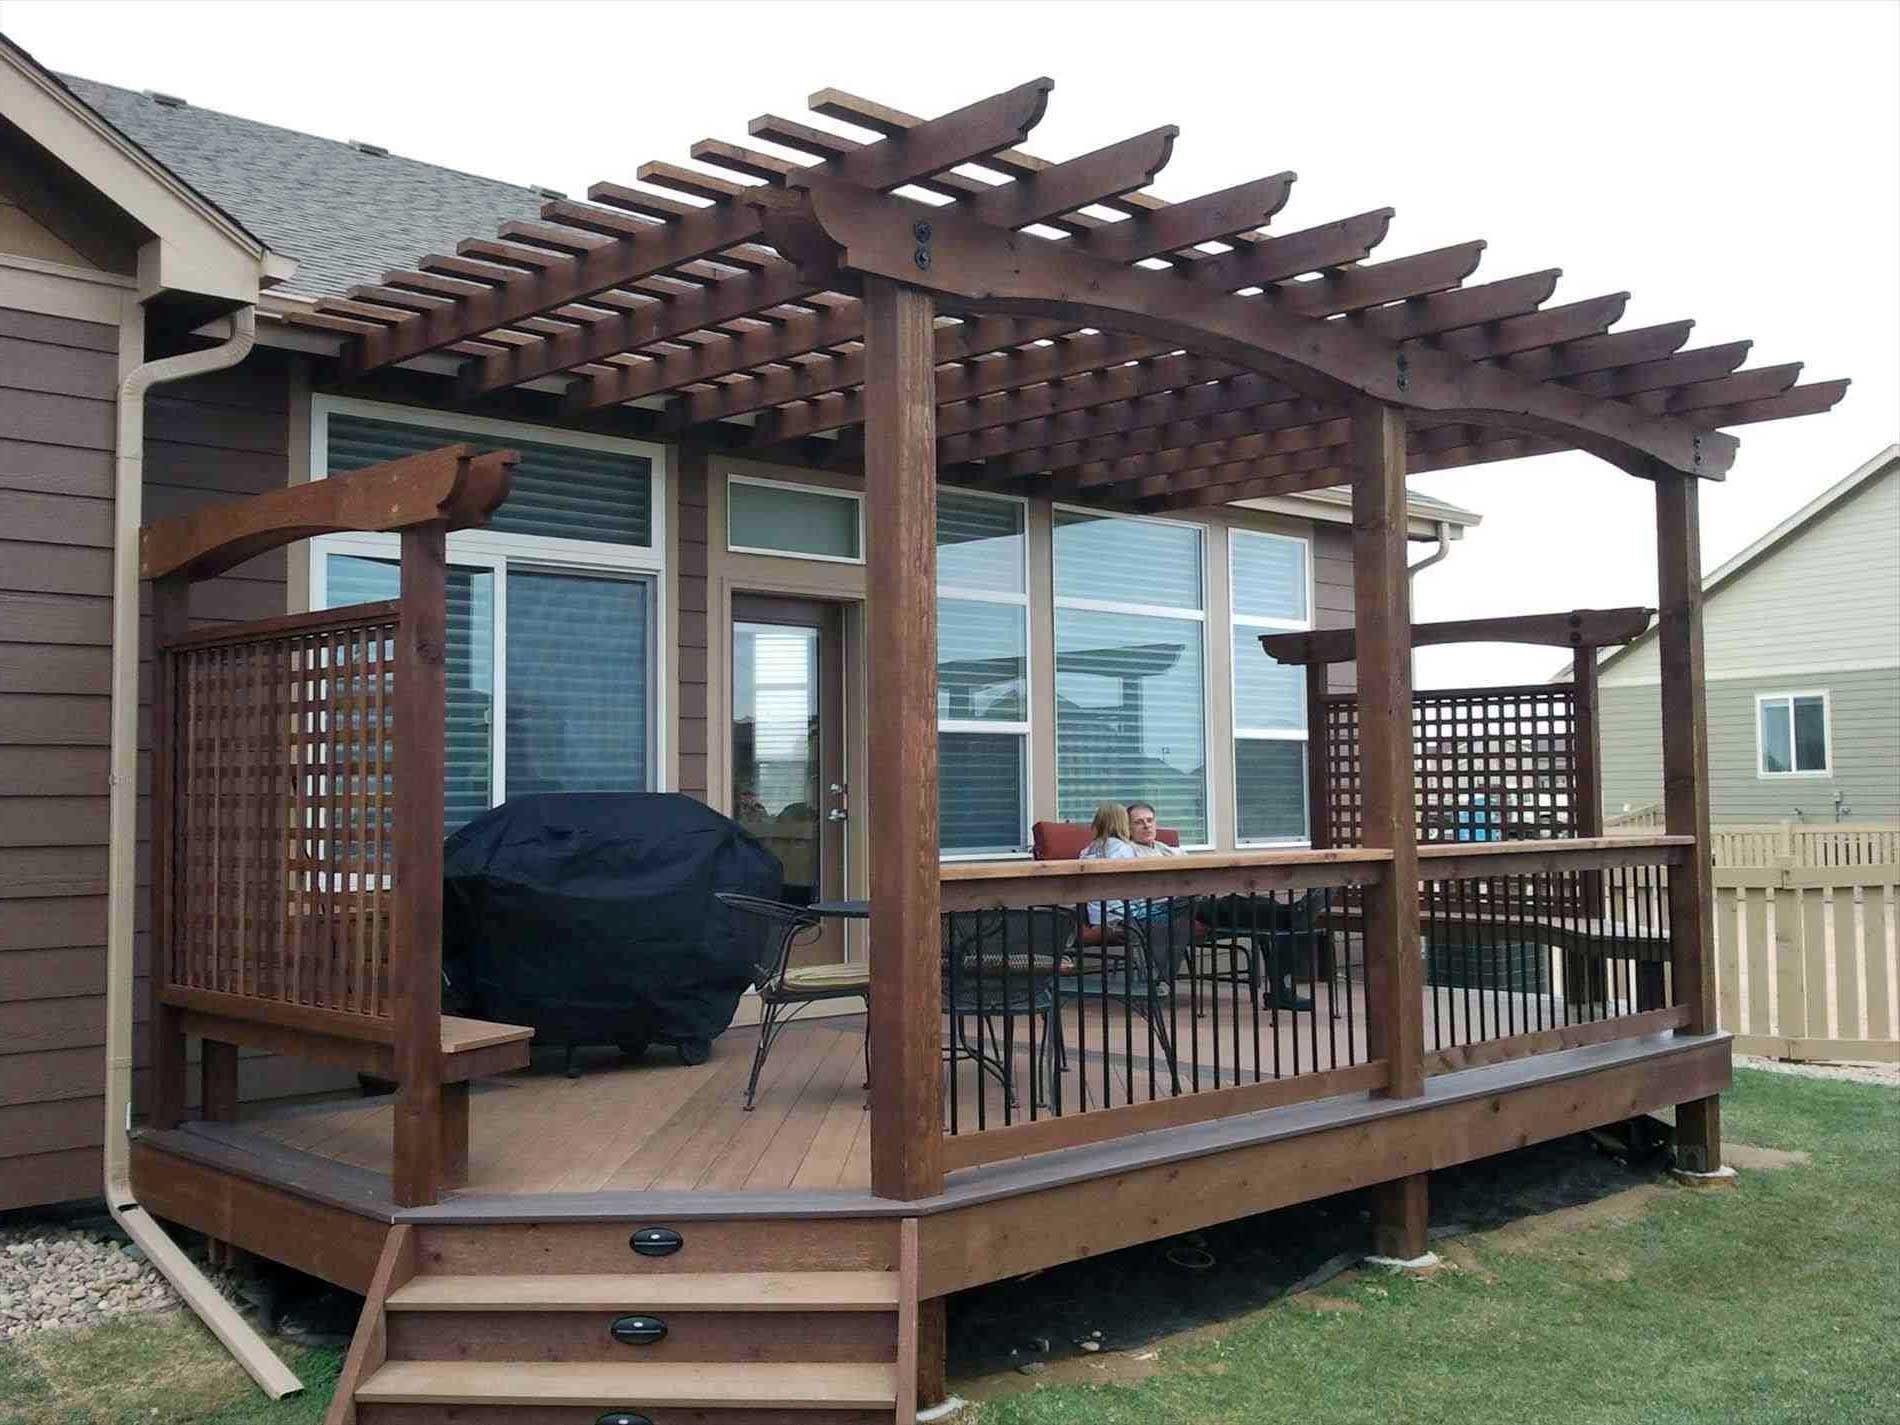 48 Comfy Deck Ideas With Pergola Small Backyard Decks Small